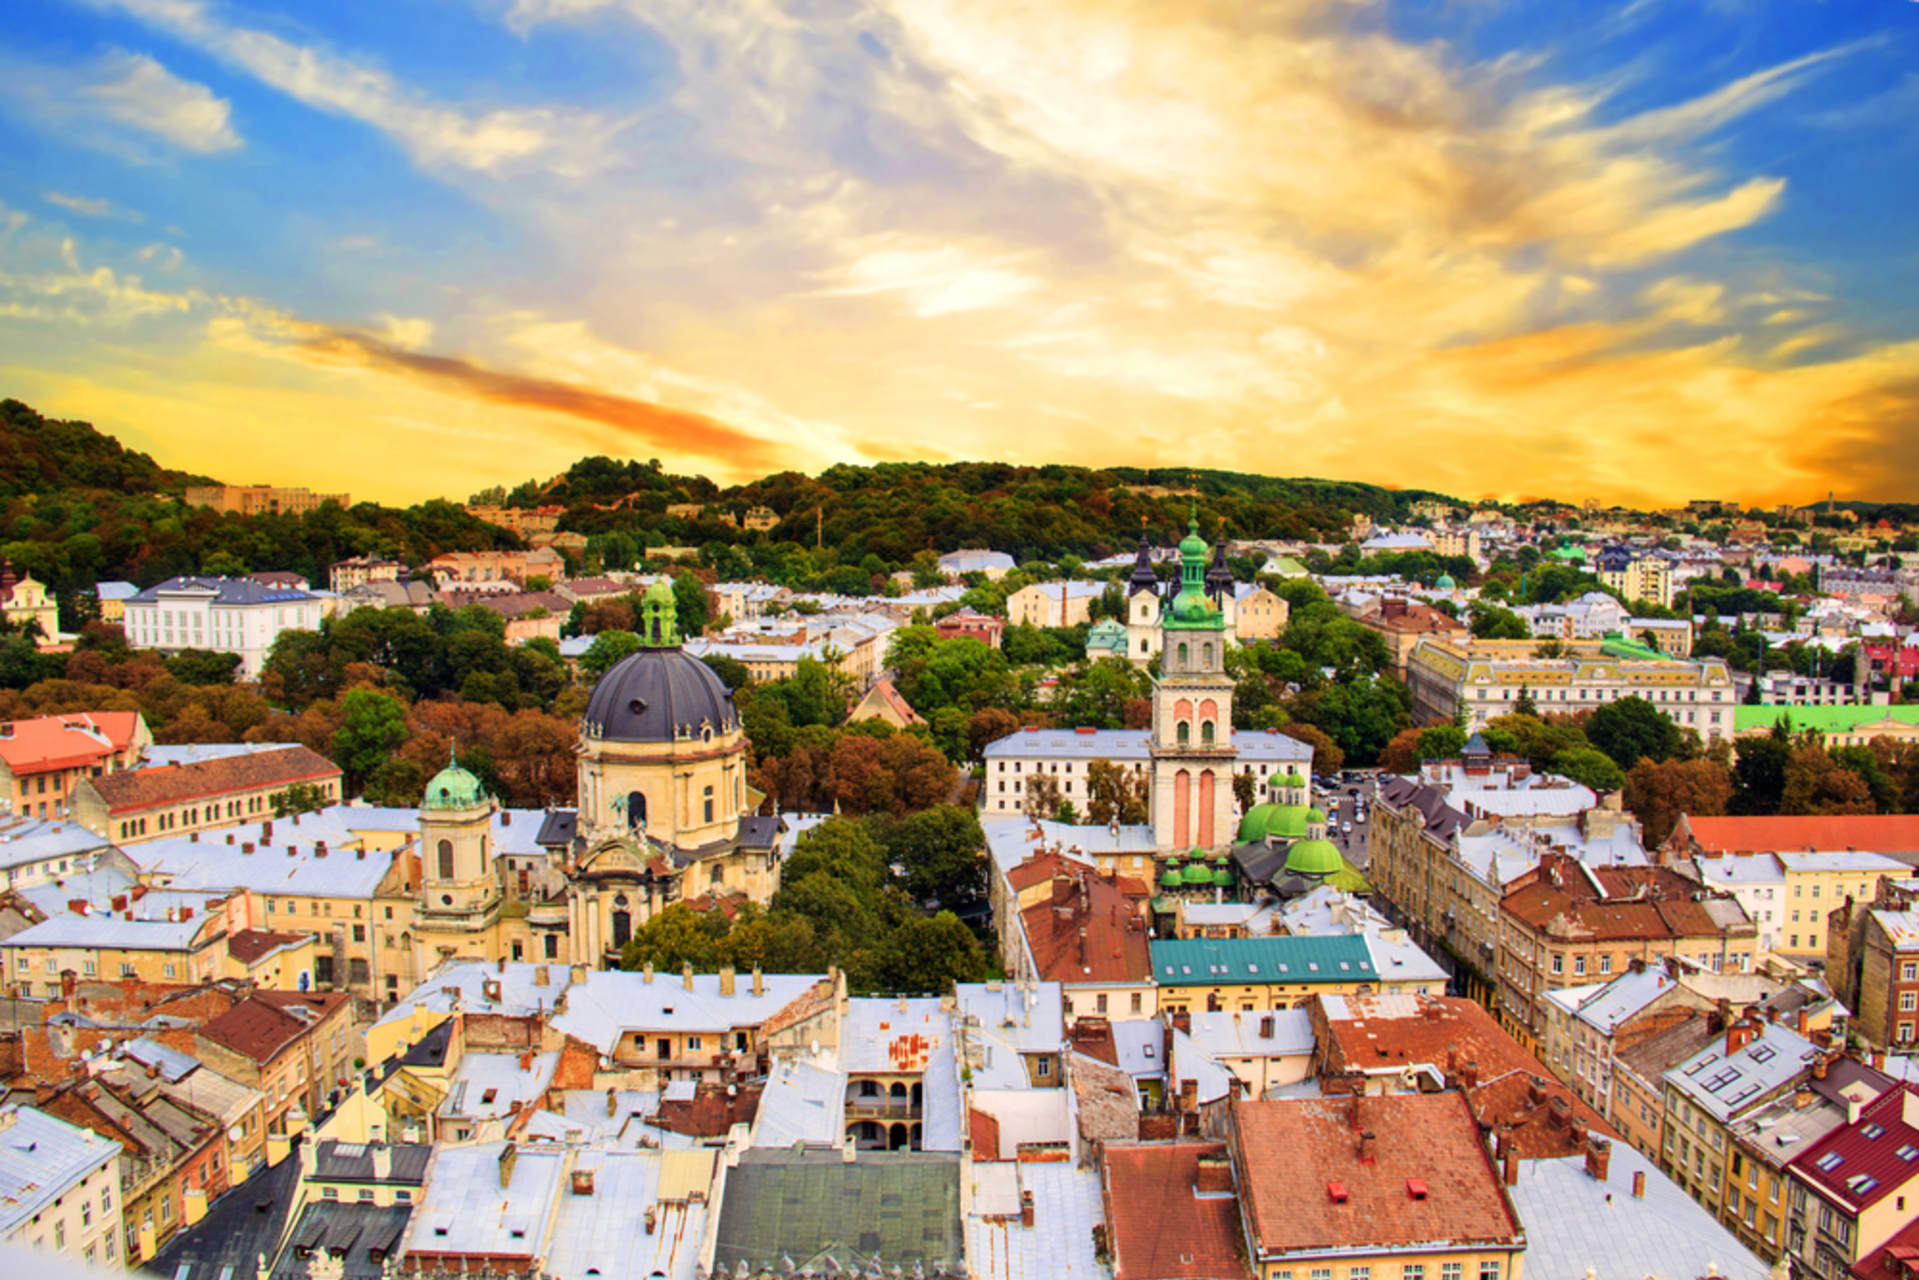 Lviv cover image